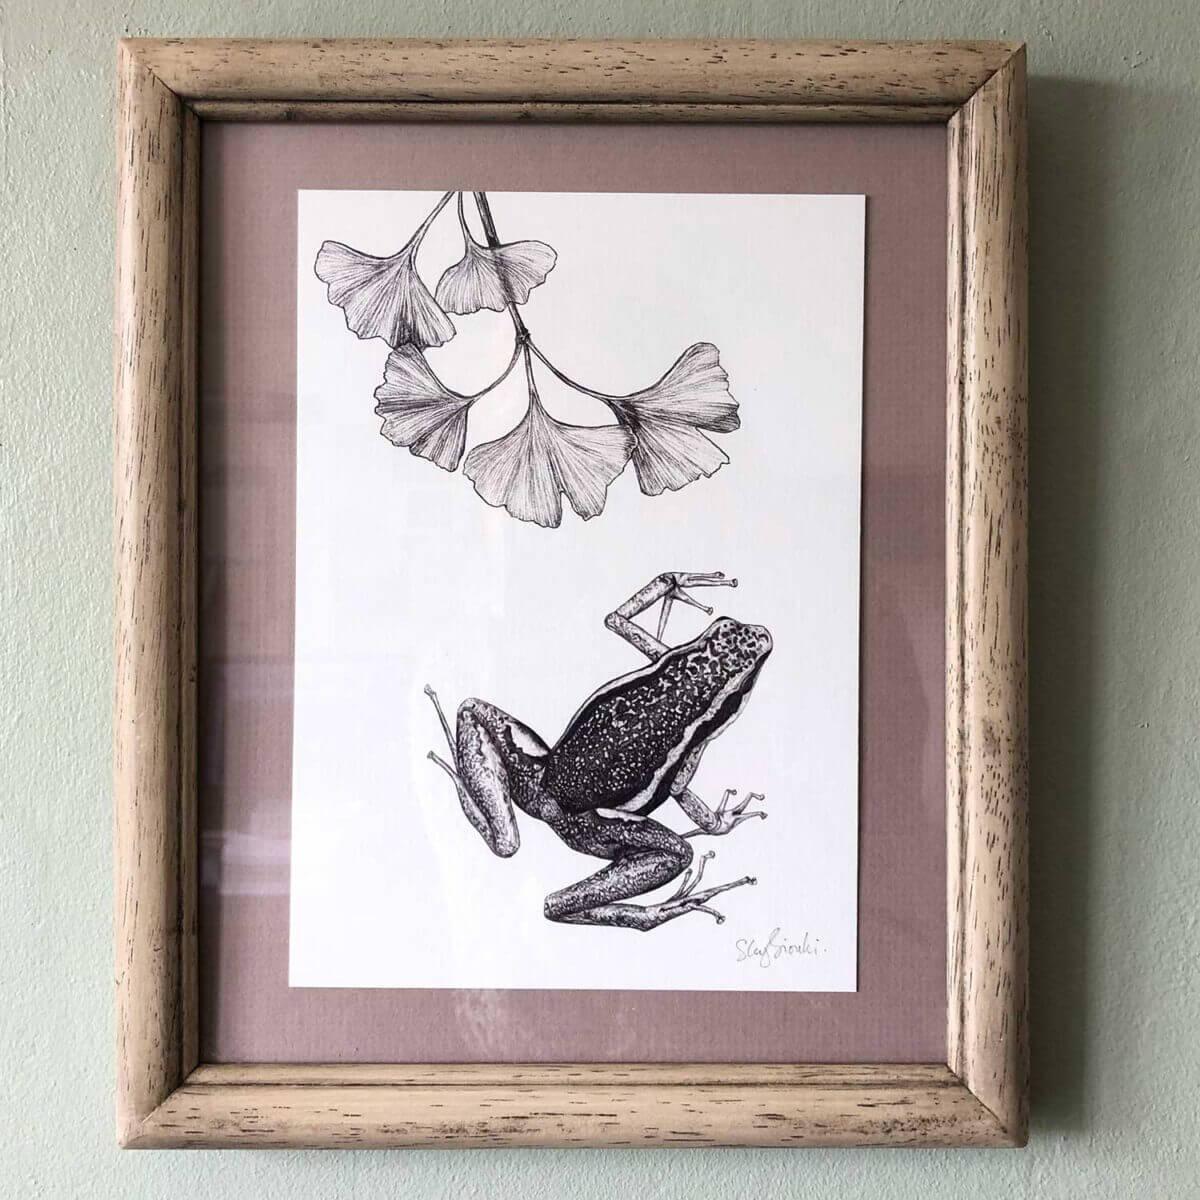 Poison-Dart-Frog-Print-Frame-Sky-Siouki